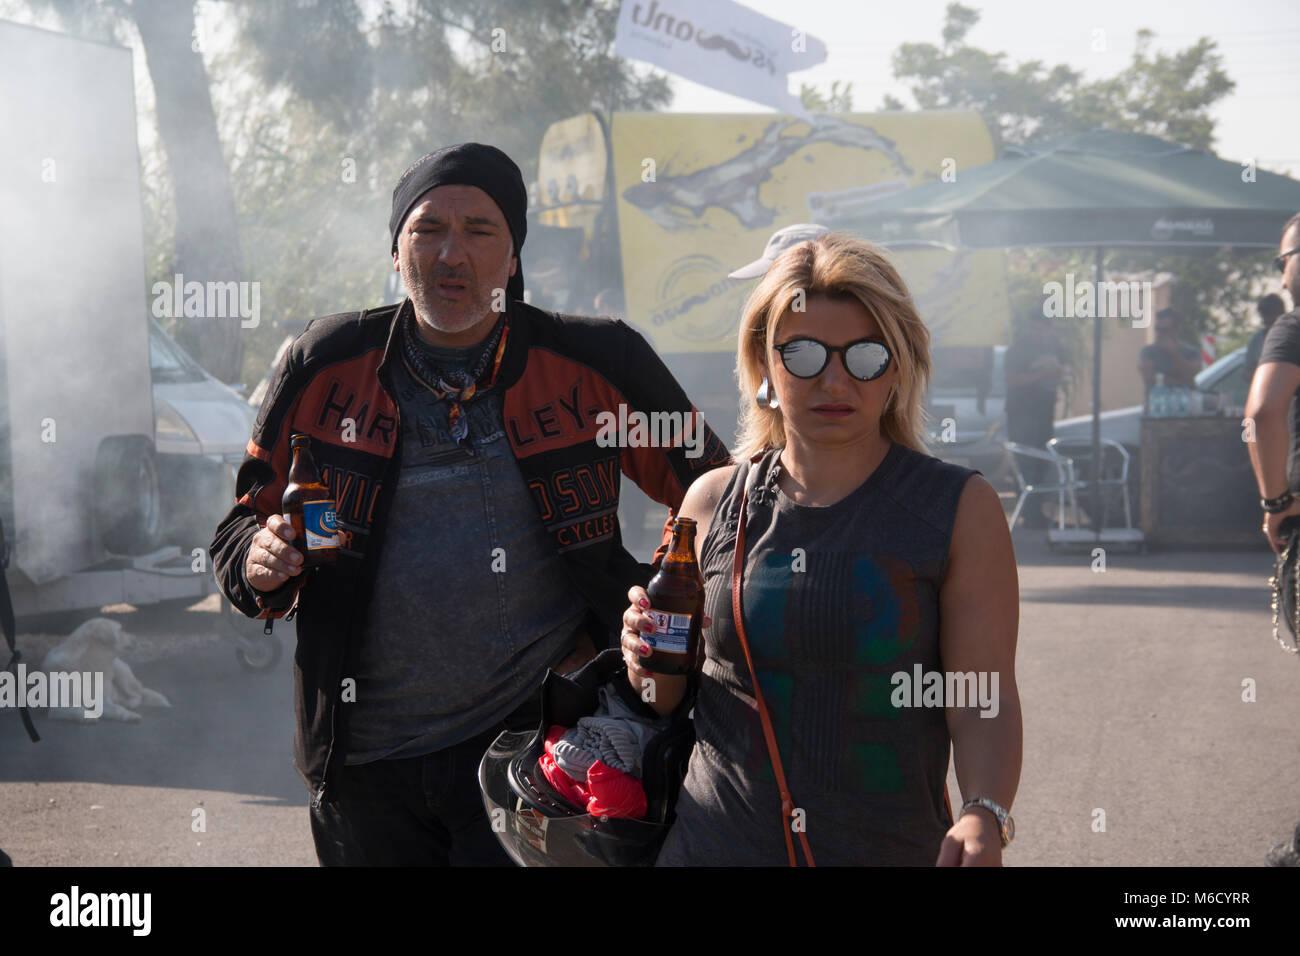 Antalya, Turkey - May 21, 2017: Antalya, Harley Davidson motor convoys on the road. Festival name is Antalya Rally, - Stock Image